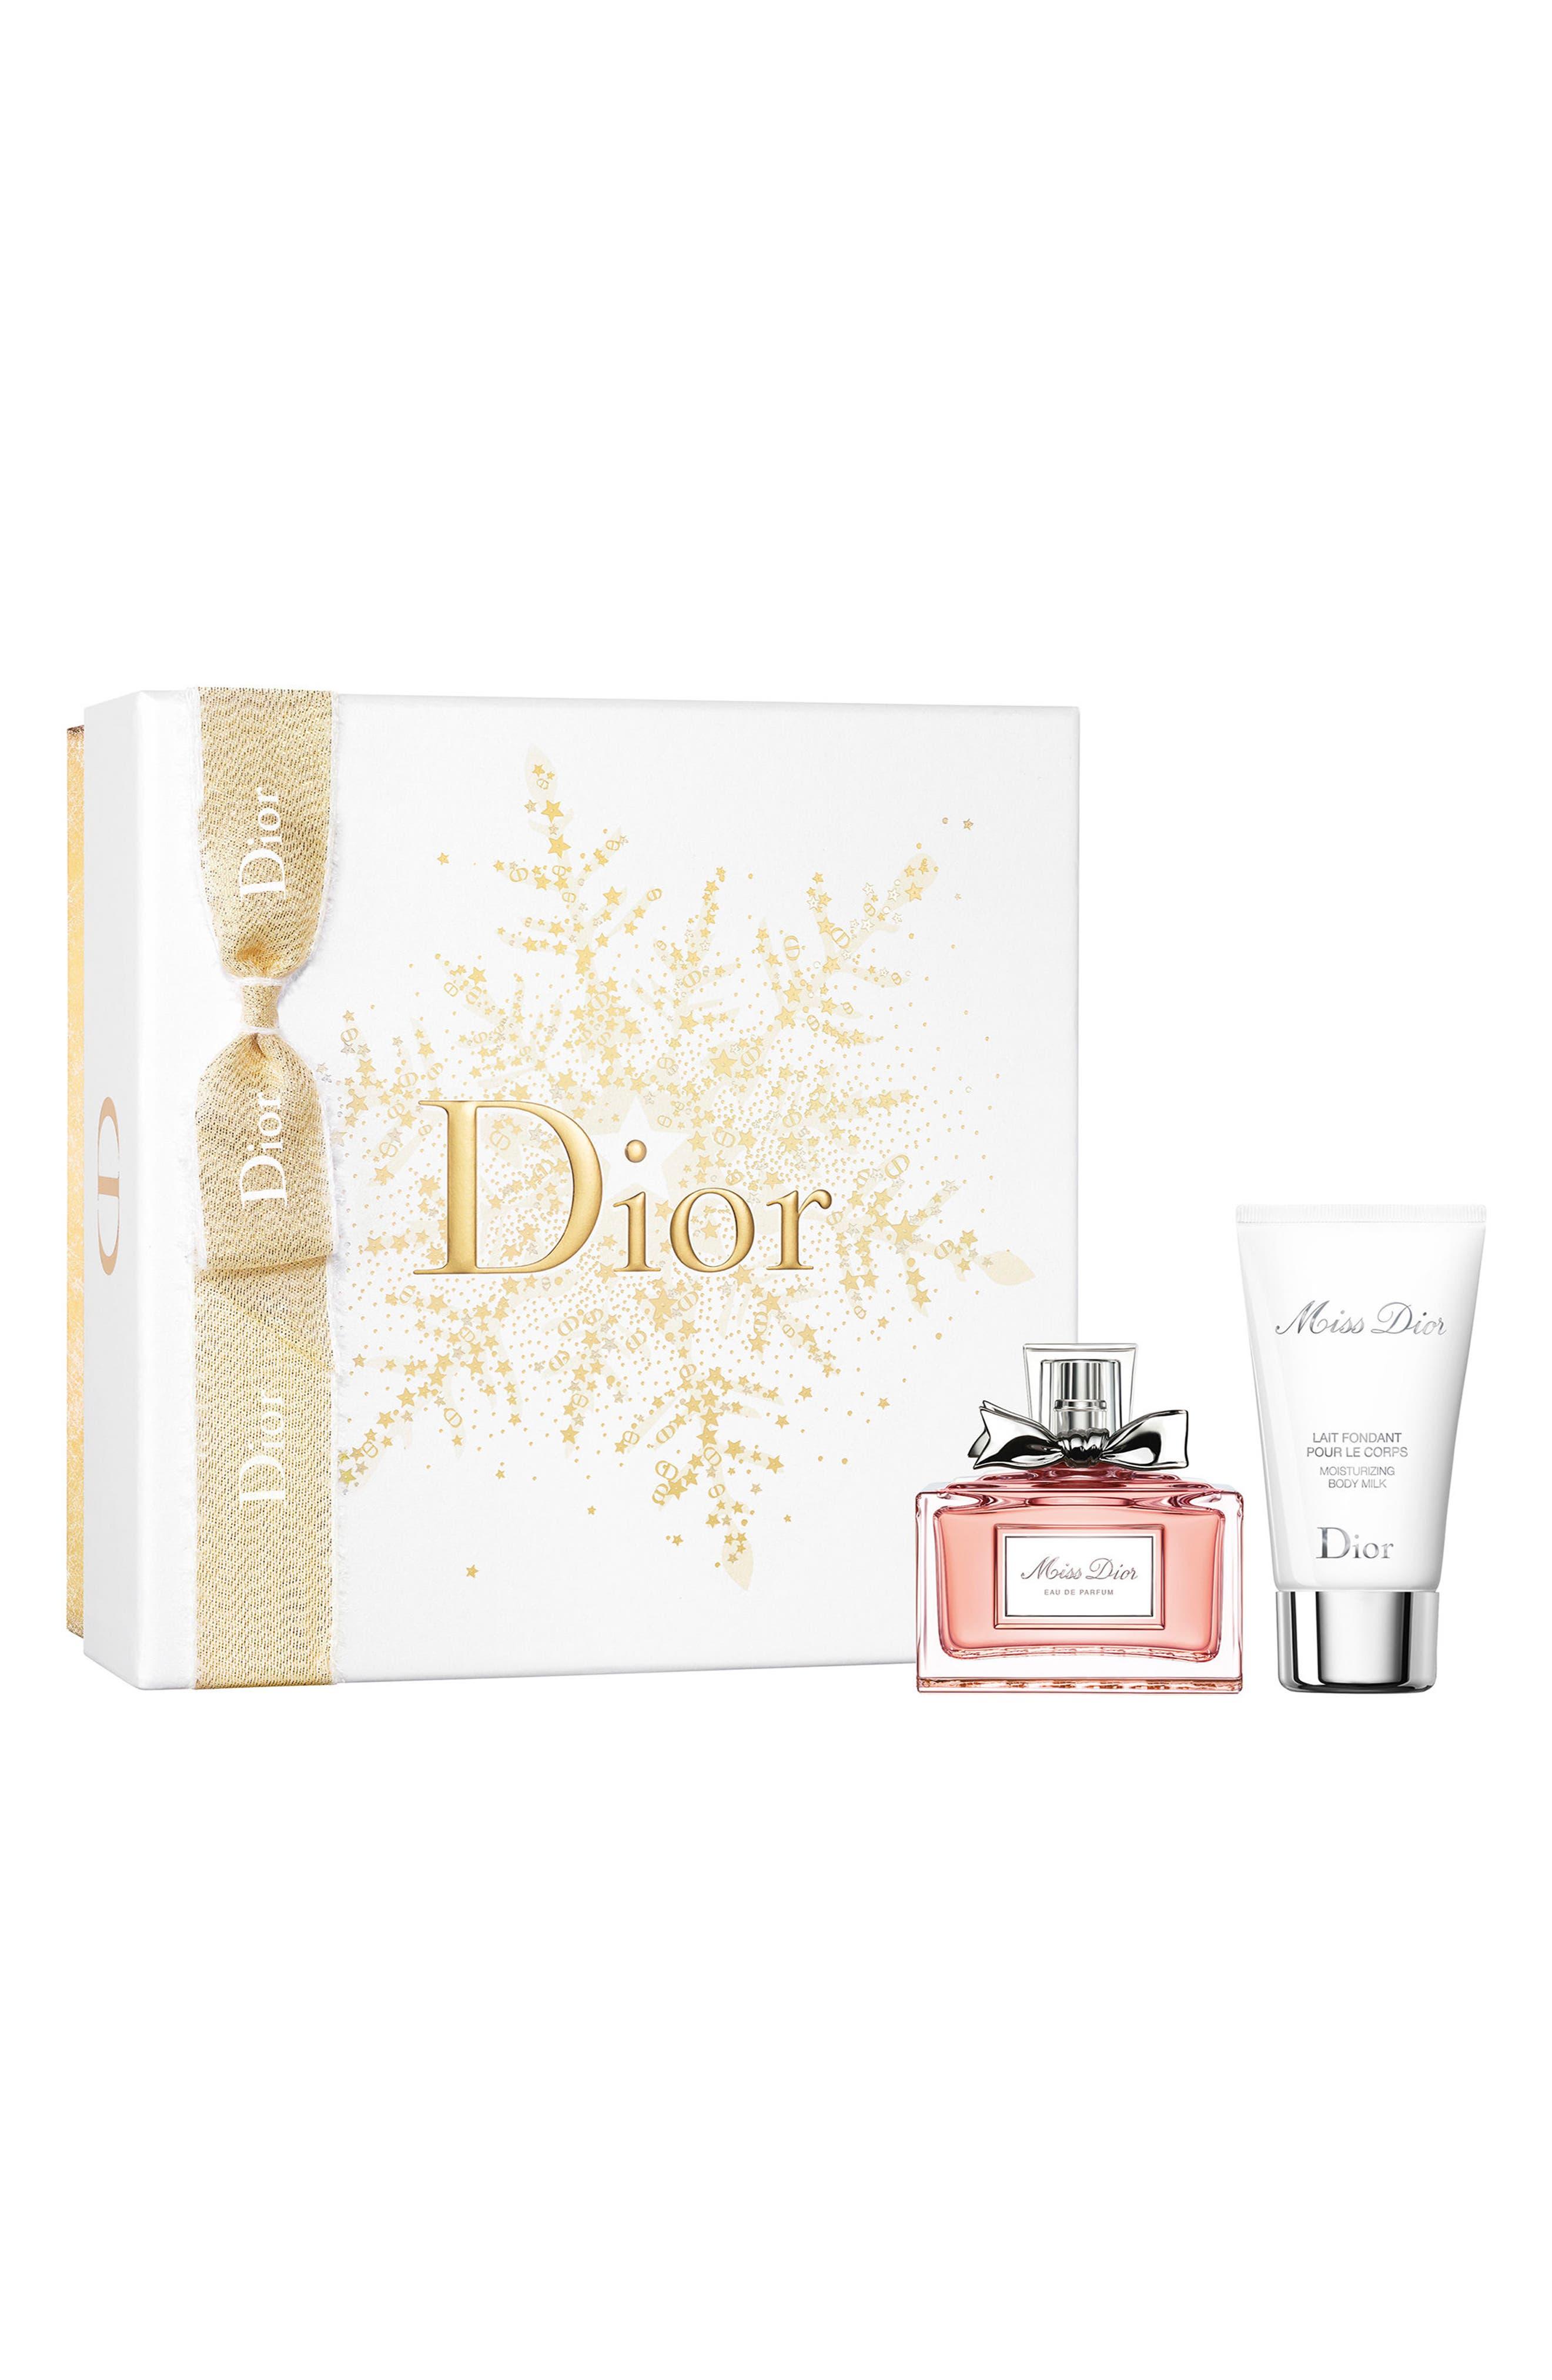 Main Image - Dior Miss Dior Small Signature Set